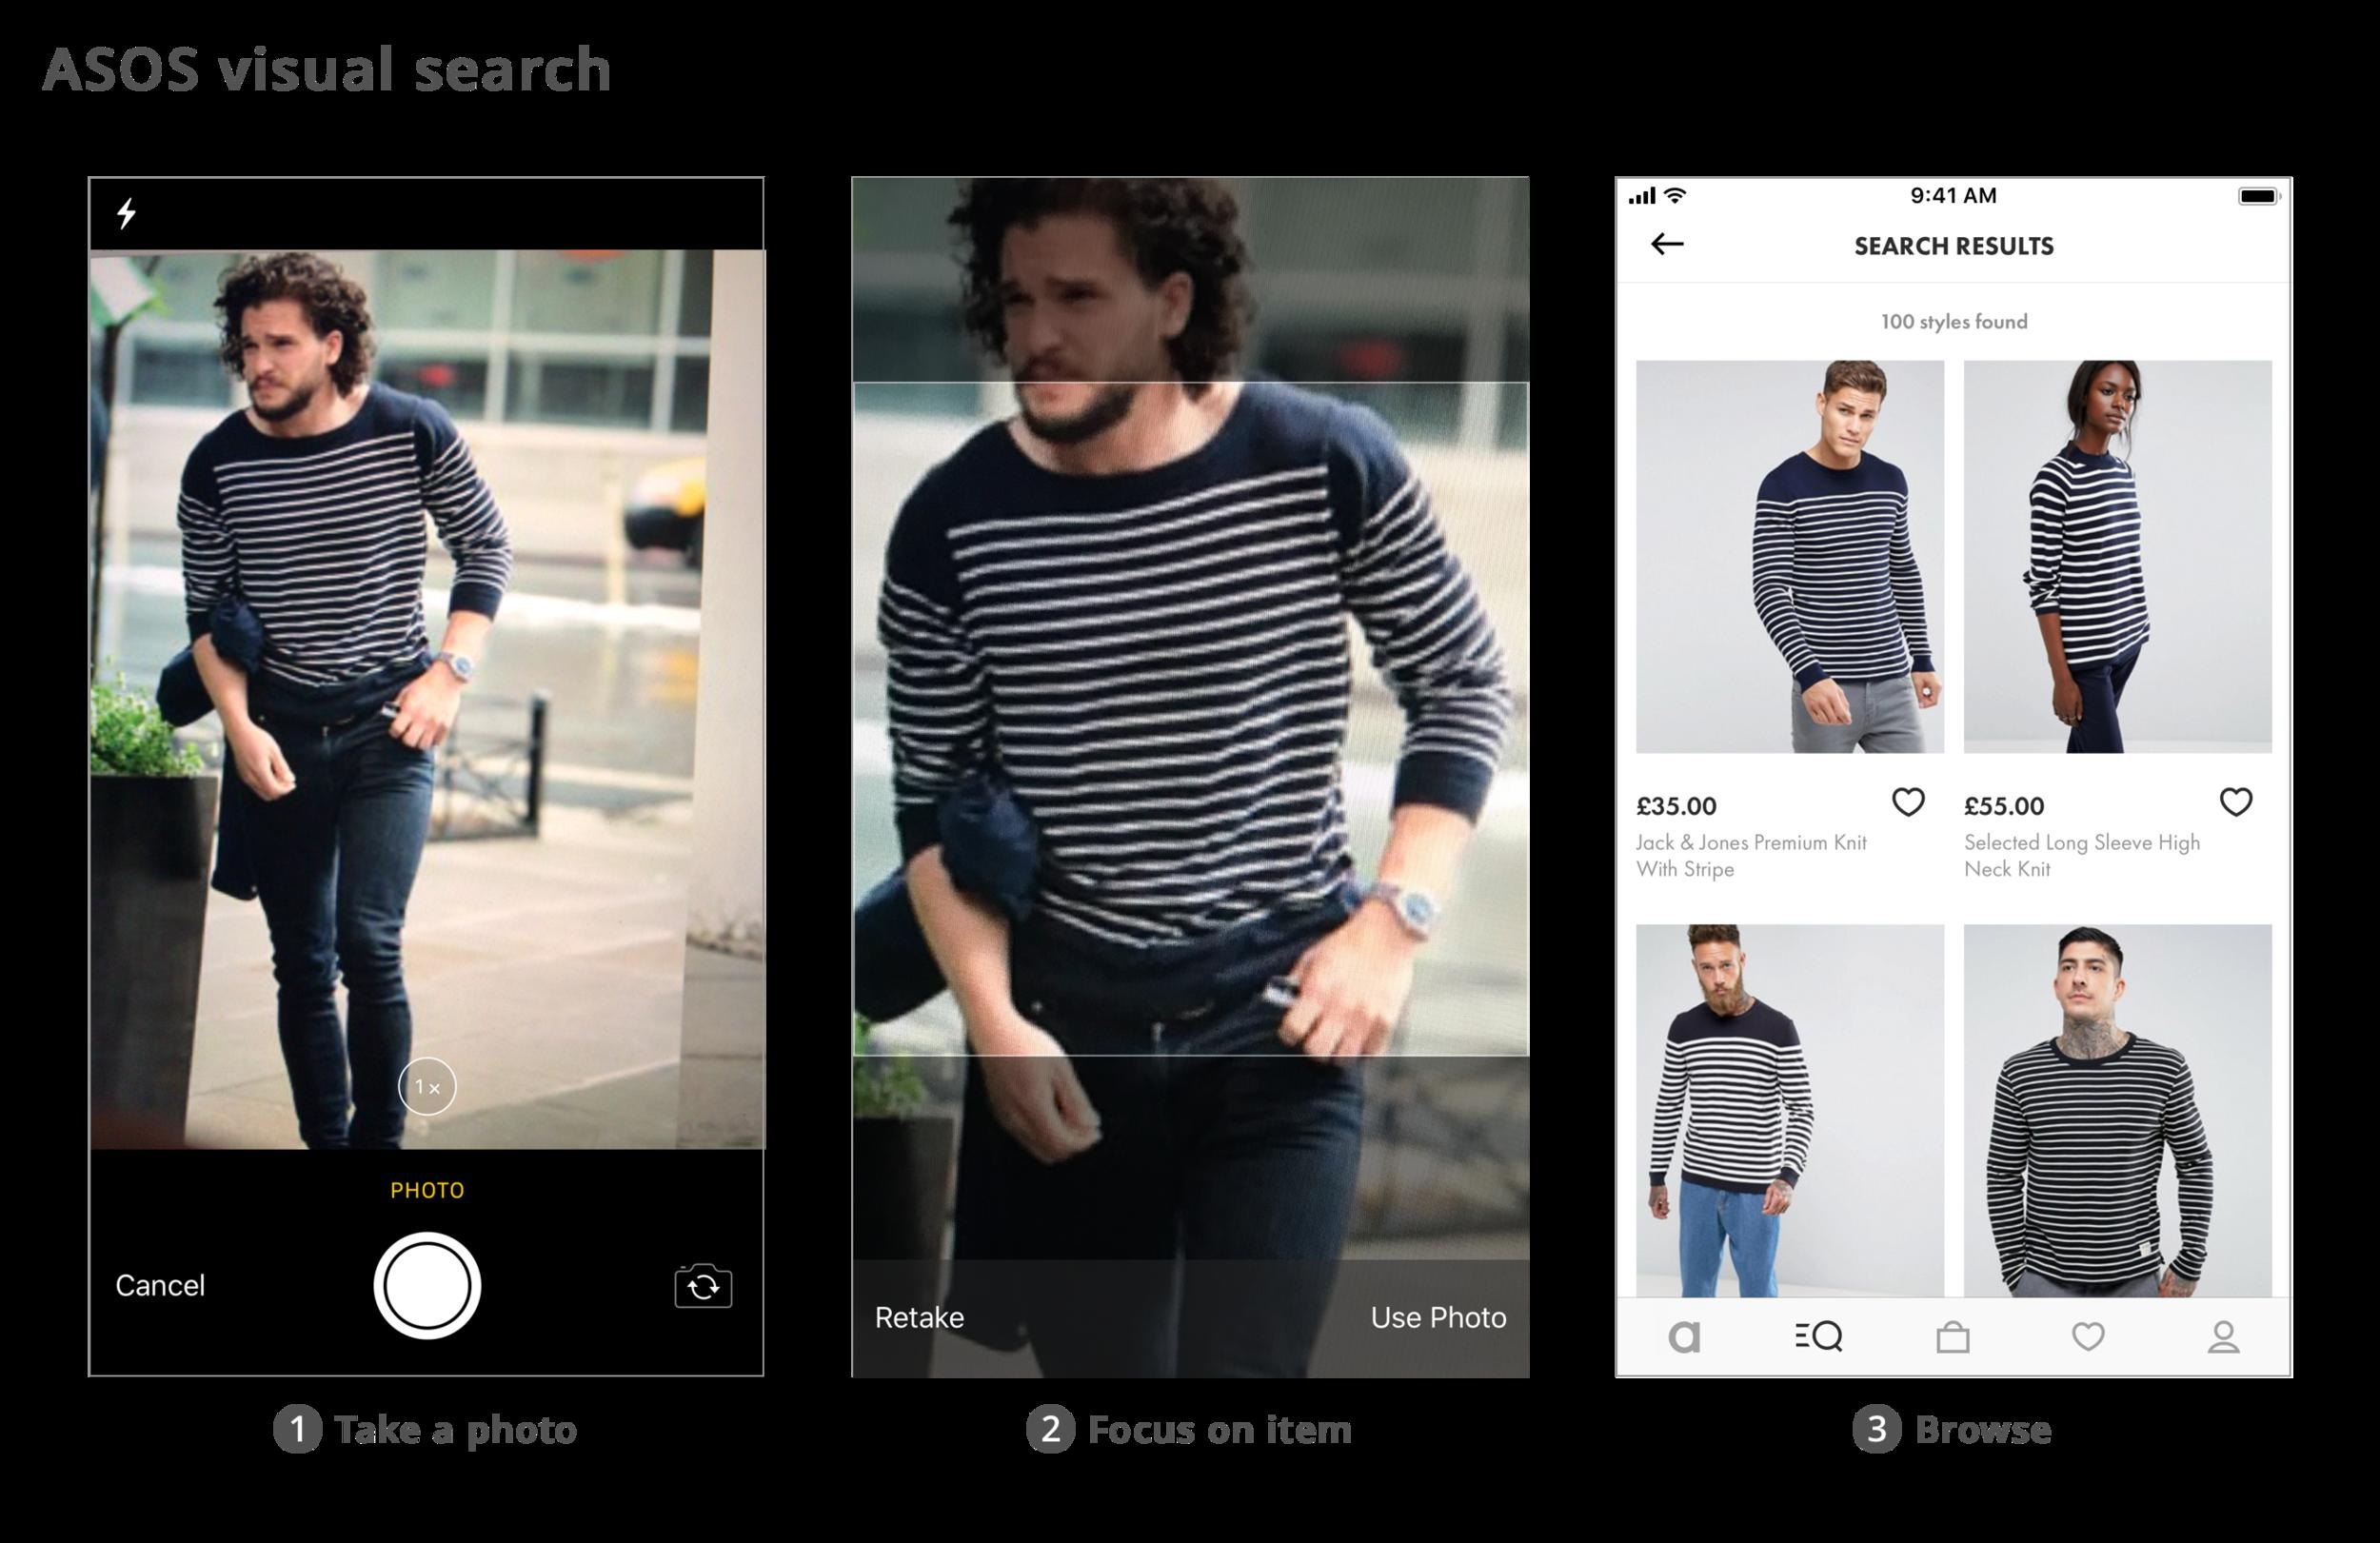 viventium-design-zac-kraemer-visual-search-retail-design-5.png